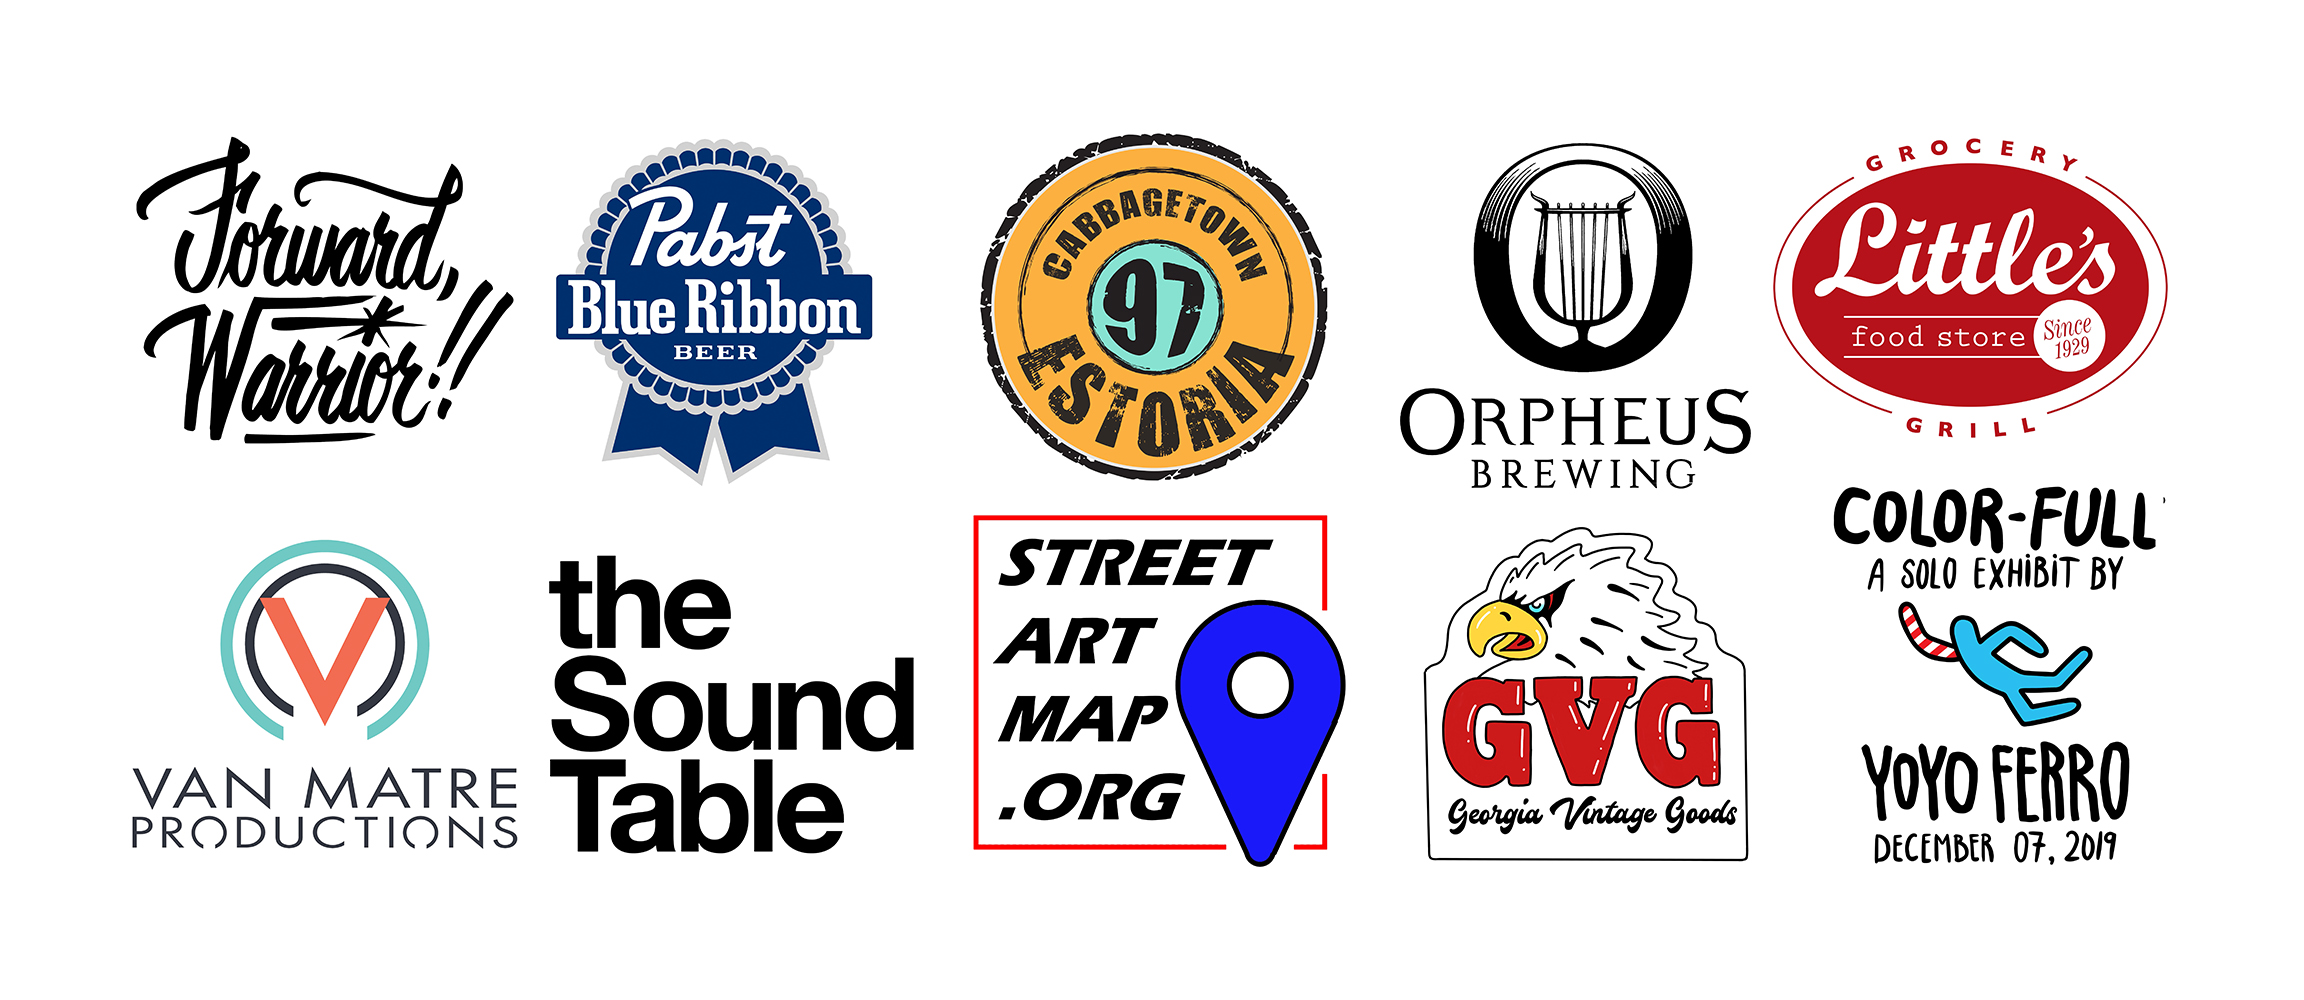 Forward Warrior 2019 Major Sponsors: Pabst Blue Ribbon, 97 Estoria, Orpheus Brewing, Little's Food Store, Van Matre Productions, The Sound Table, Street Art Map dot ORG, Georgia Vintage Goods, and Yoyo Ferro.